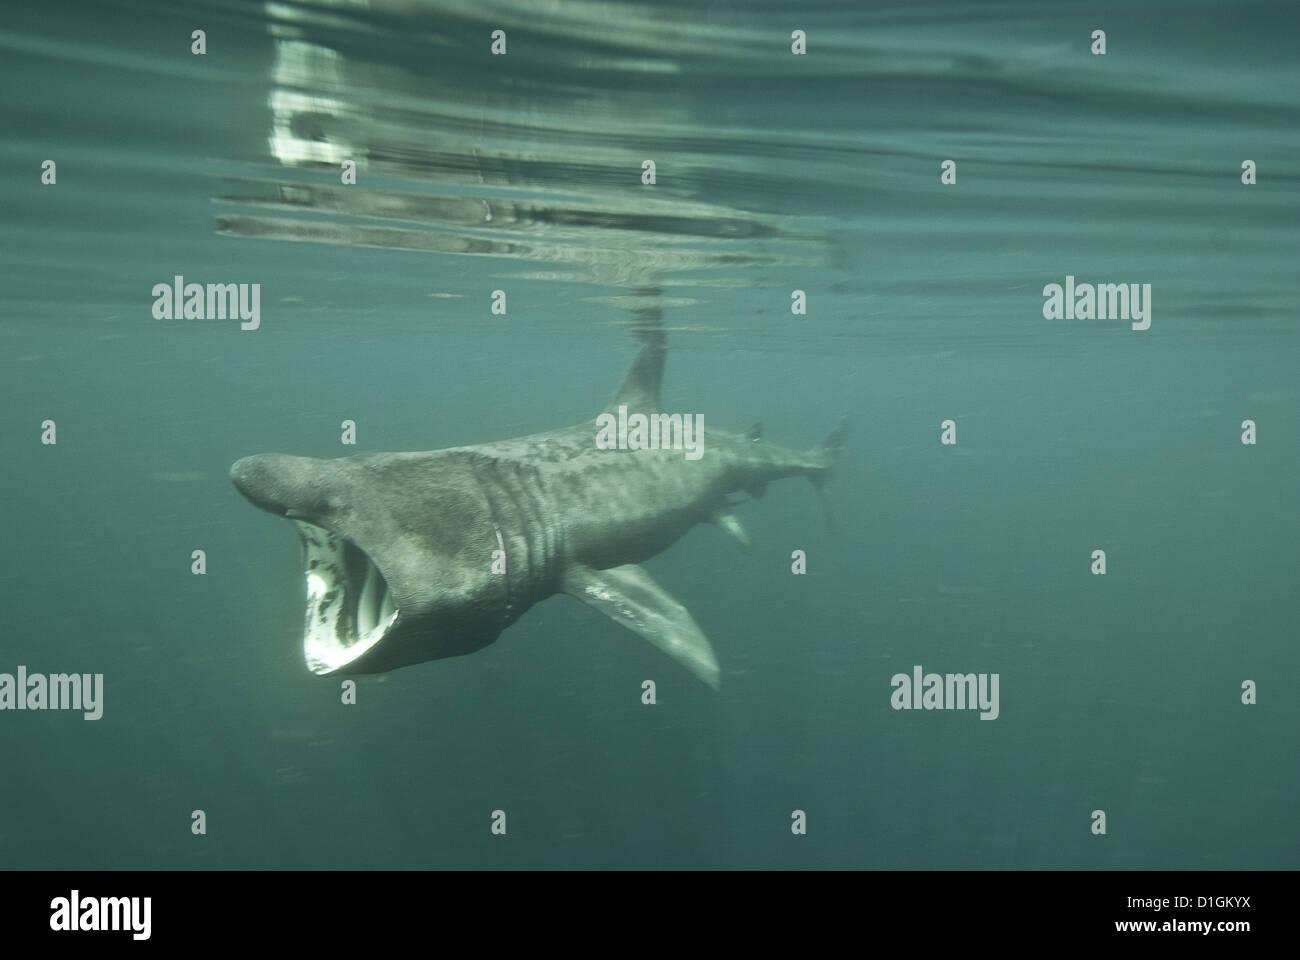 Basking shark (Cetorhinus maximus) feeding on plankton, Inner Hebrides, Scotland, United Kingdom, Europe - Stock Image